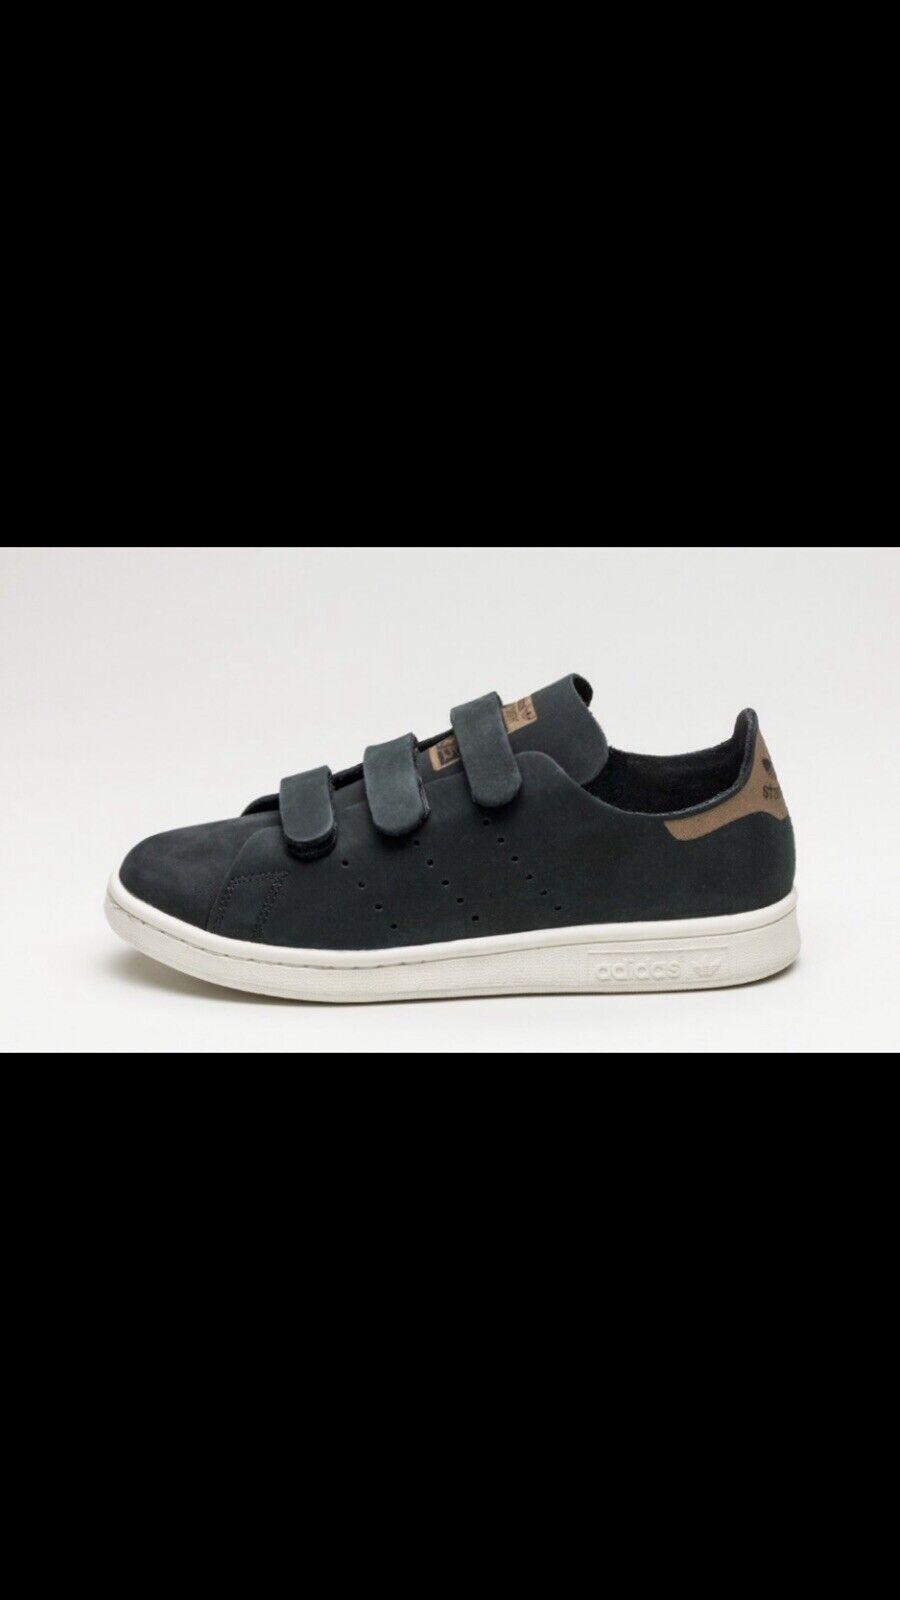 Nuevo Adidas stansmith, talla uk58.